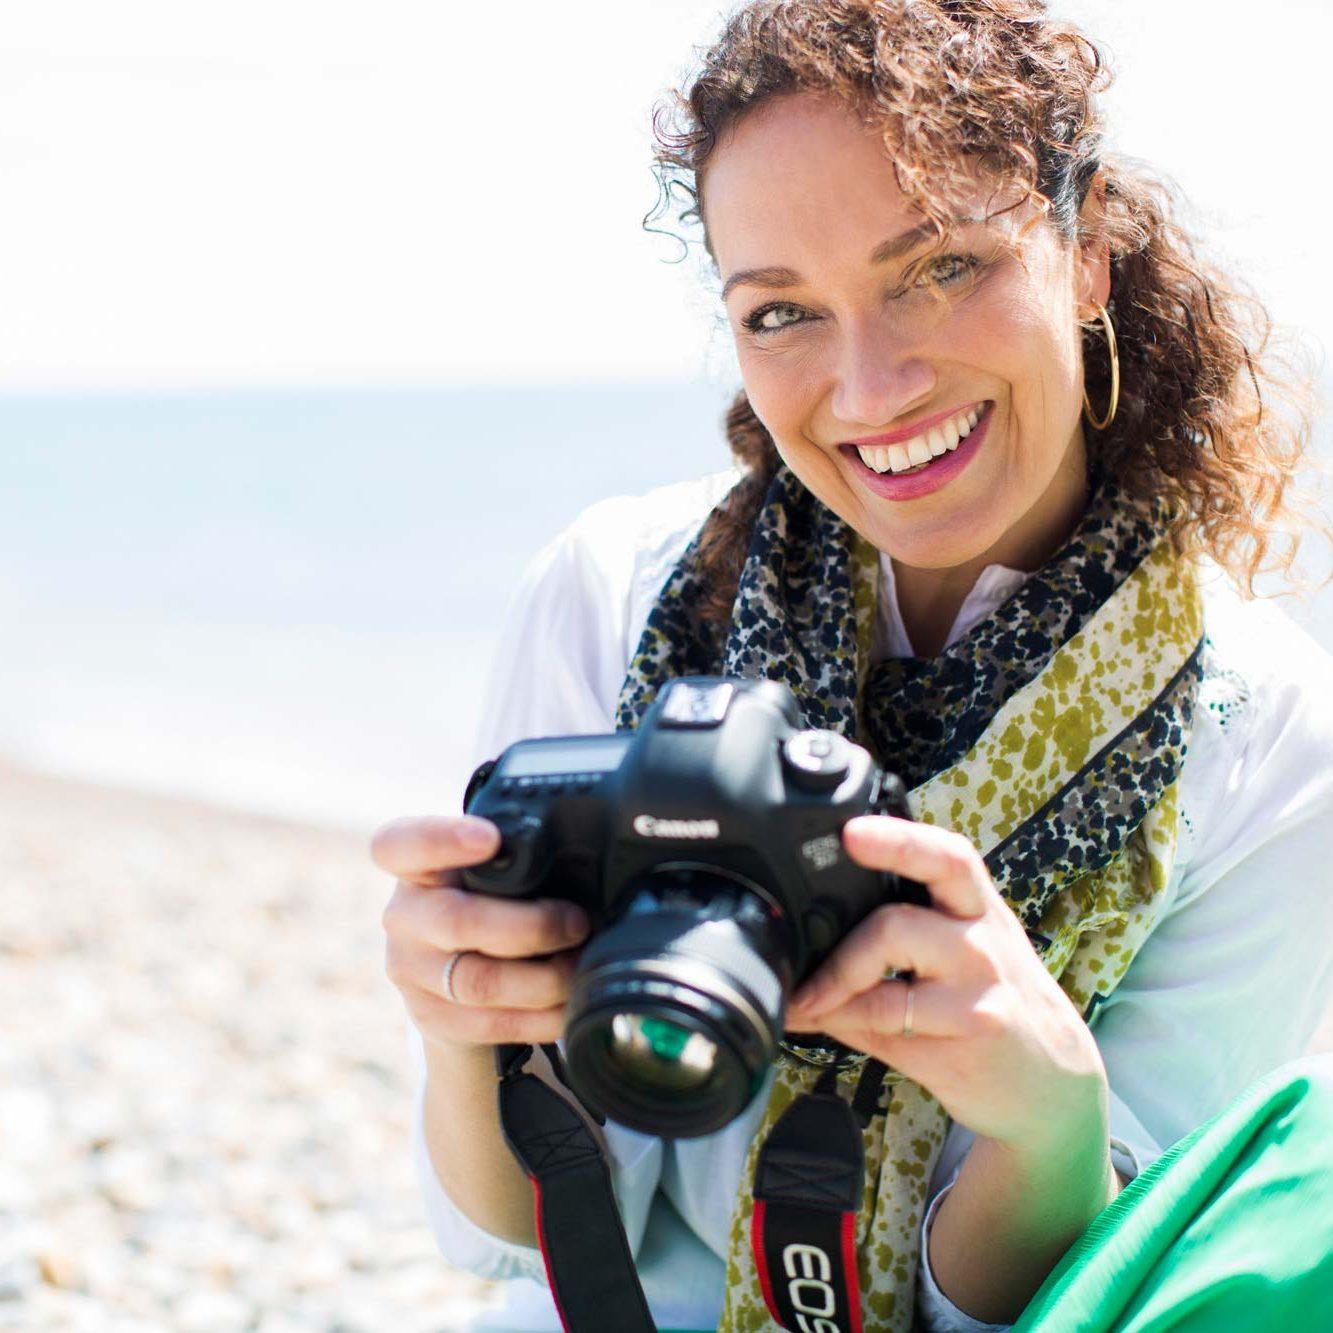 Portrait Photographer London UK